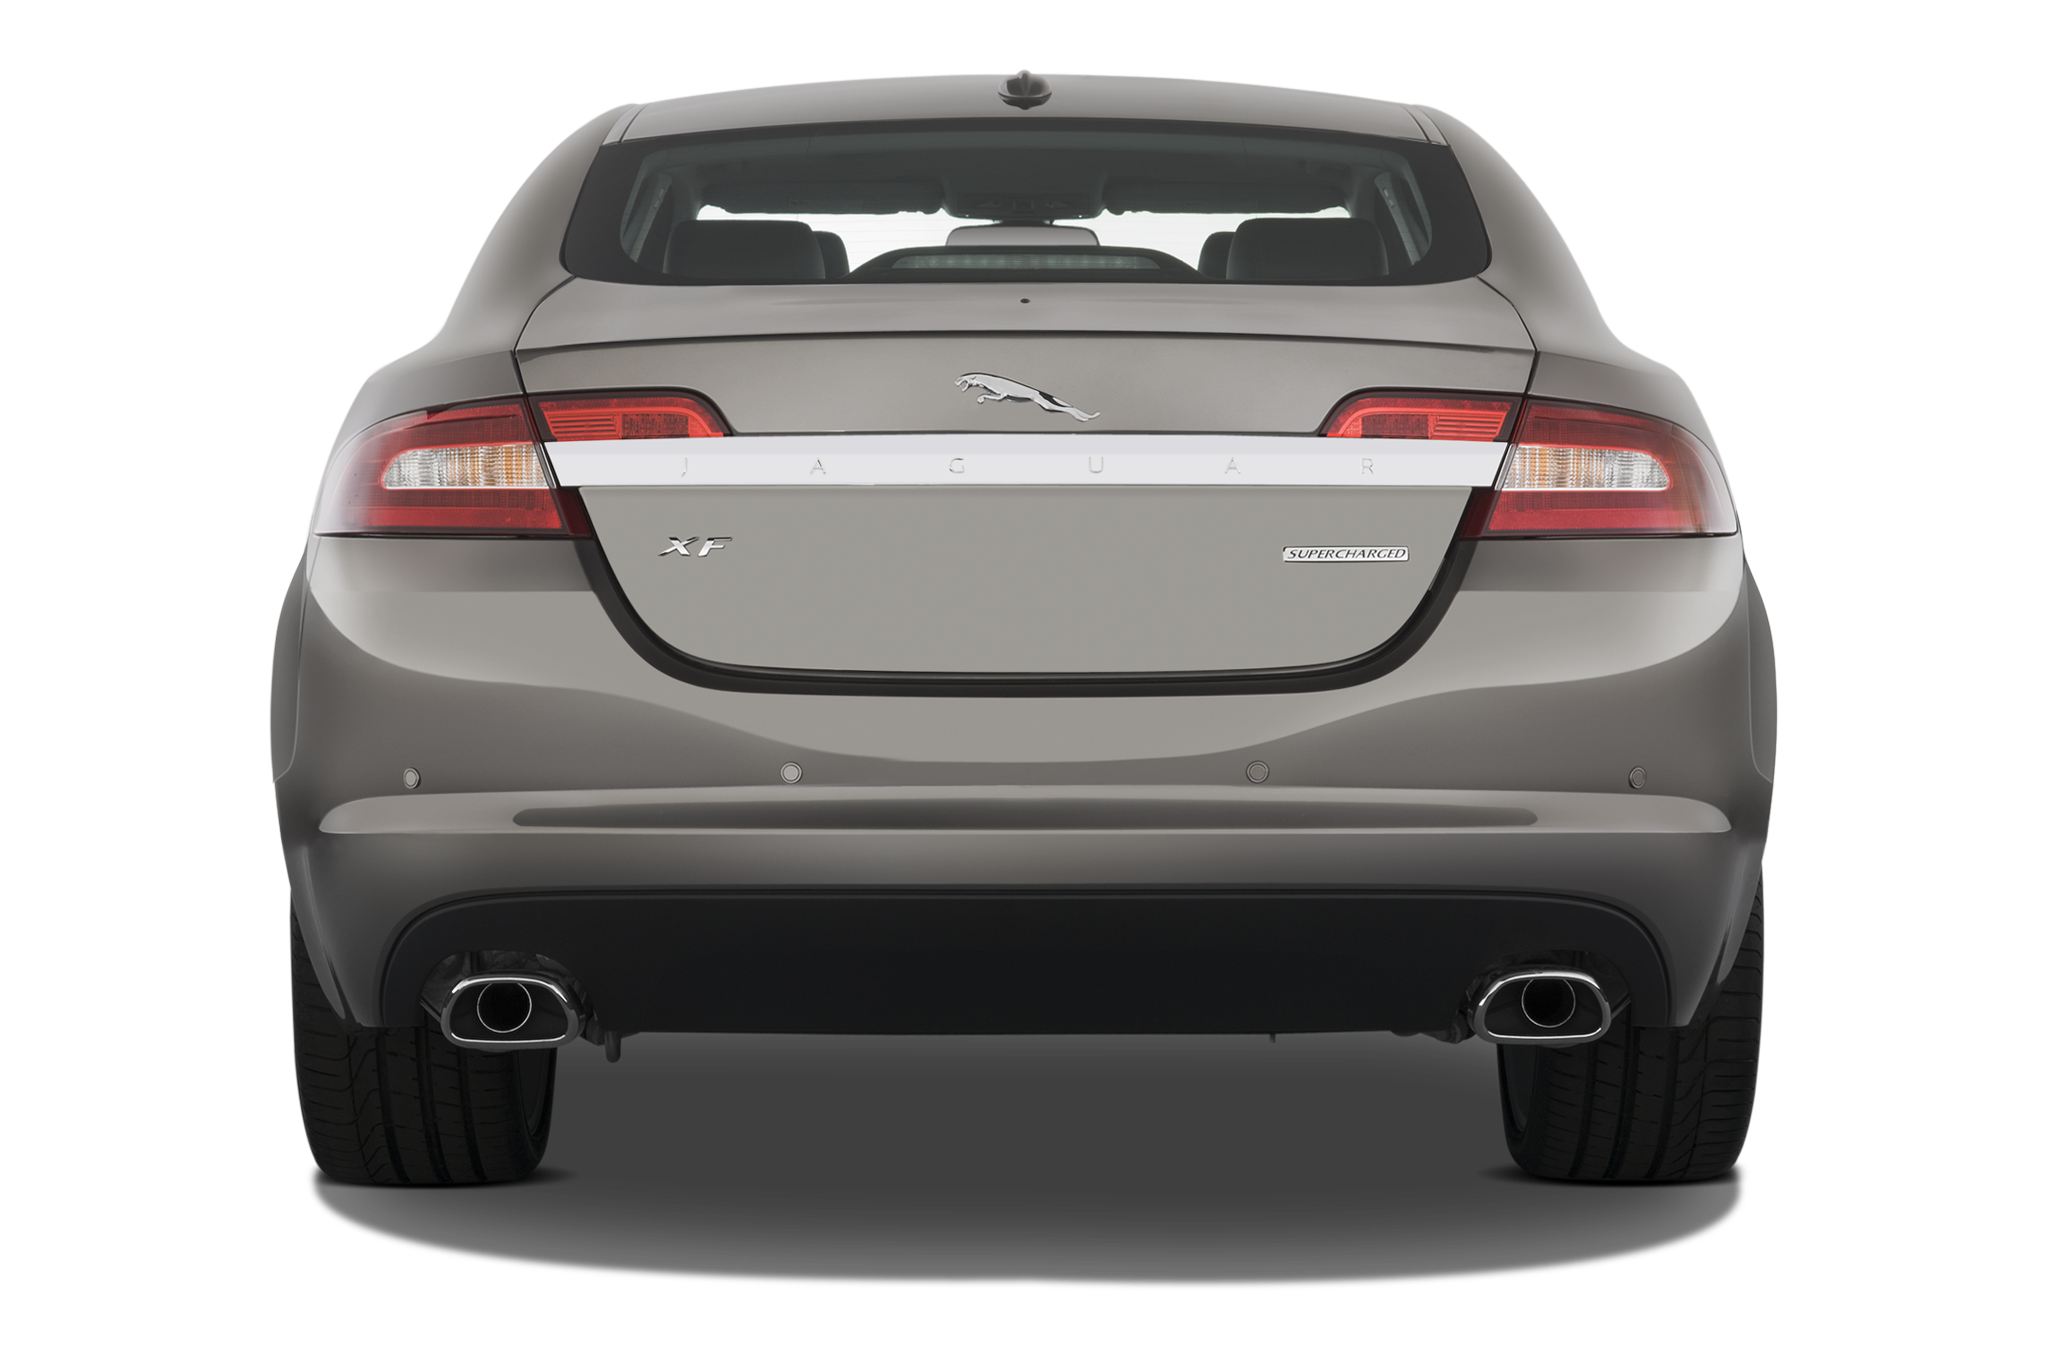 2010 jaguar xf premium vs 2011 infiniti m56 sport automobile magazine 1674 publicscrutiny Image collections